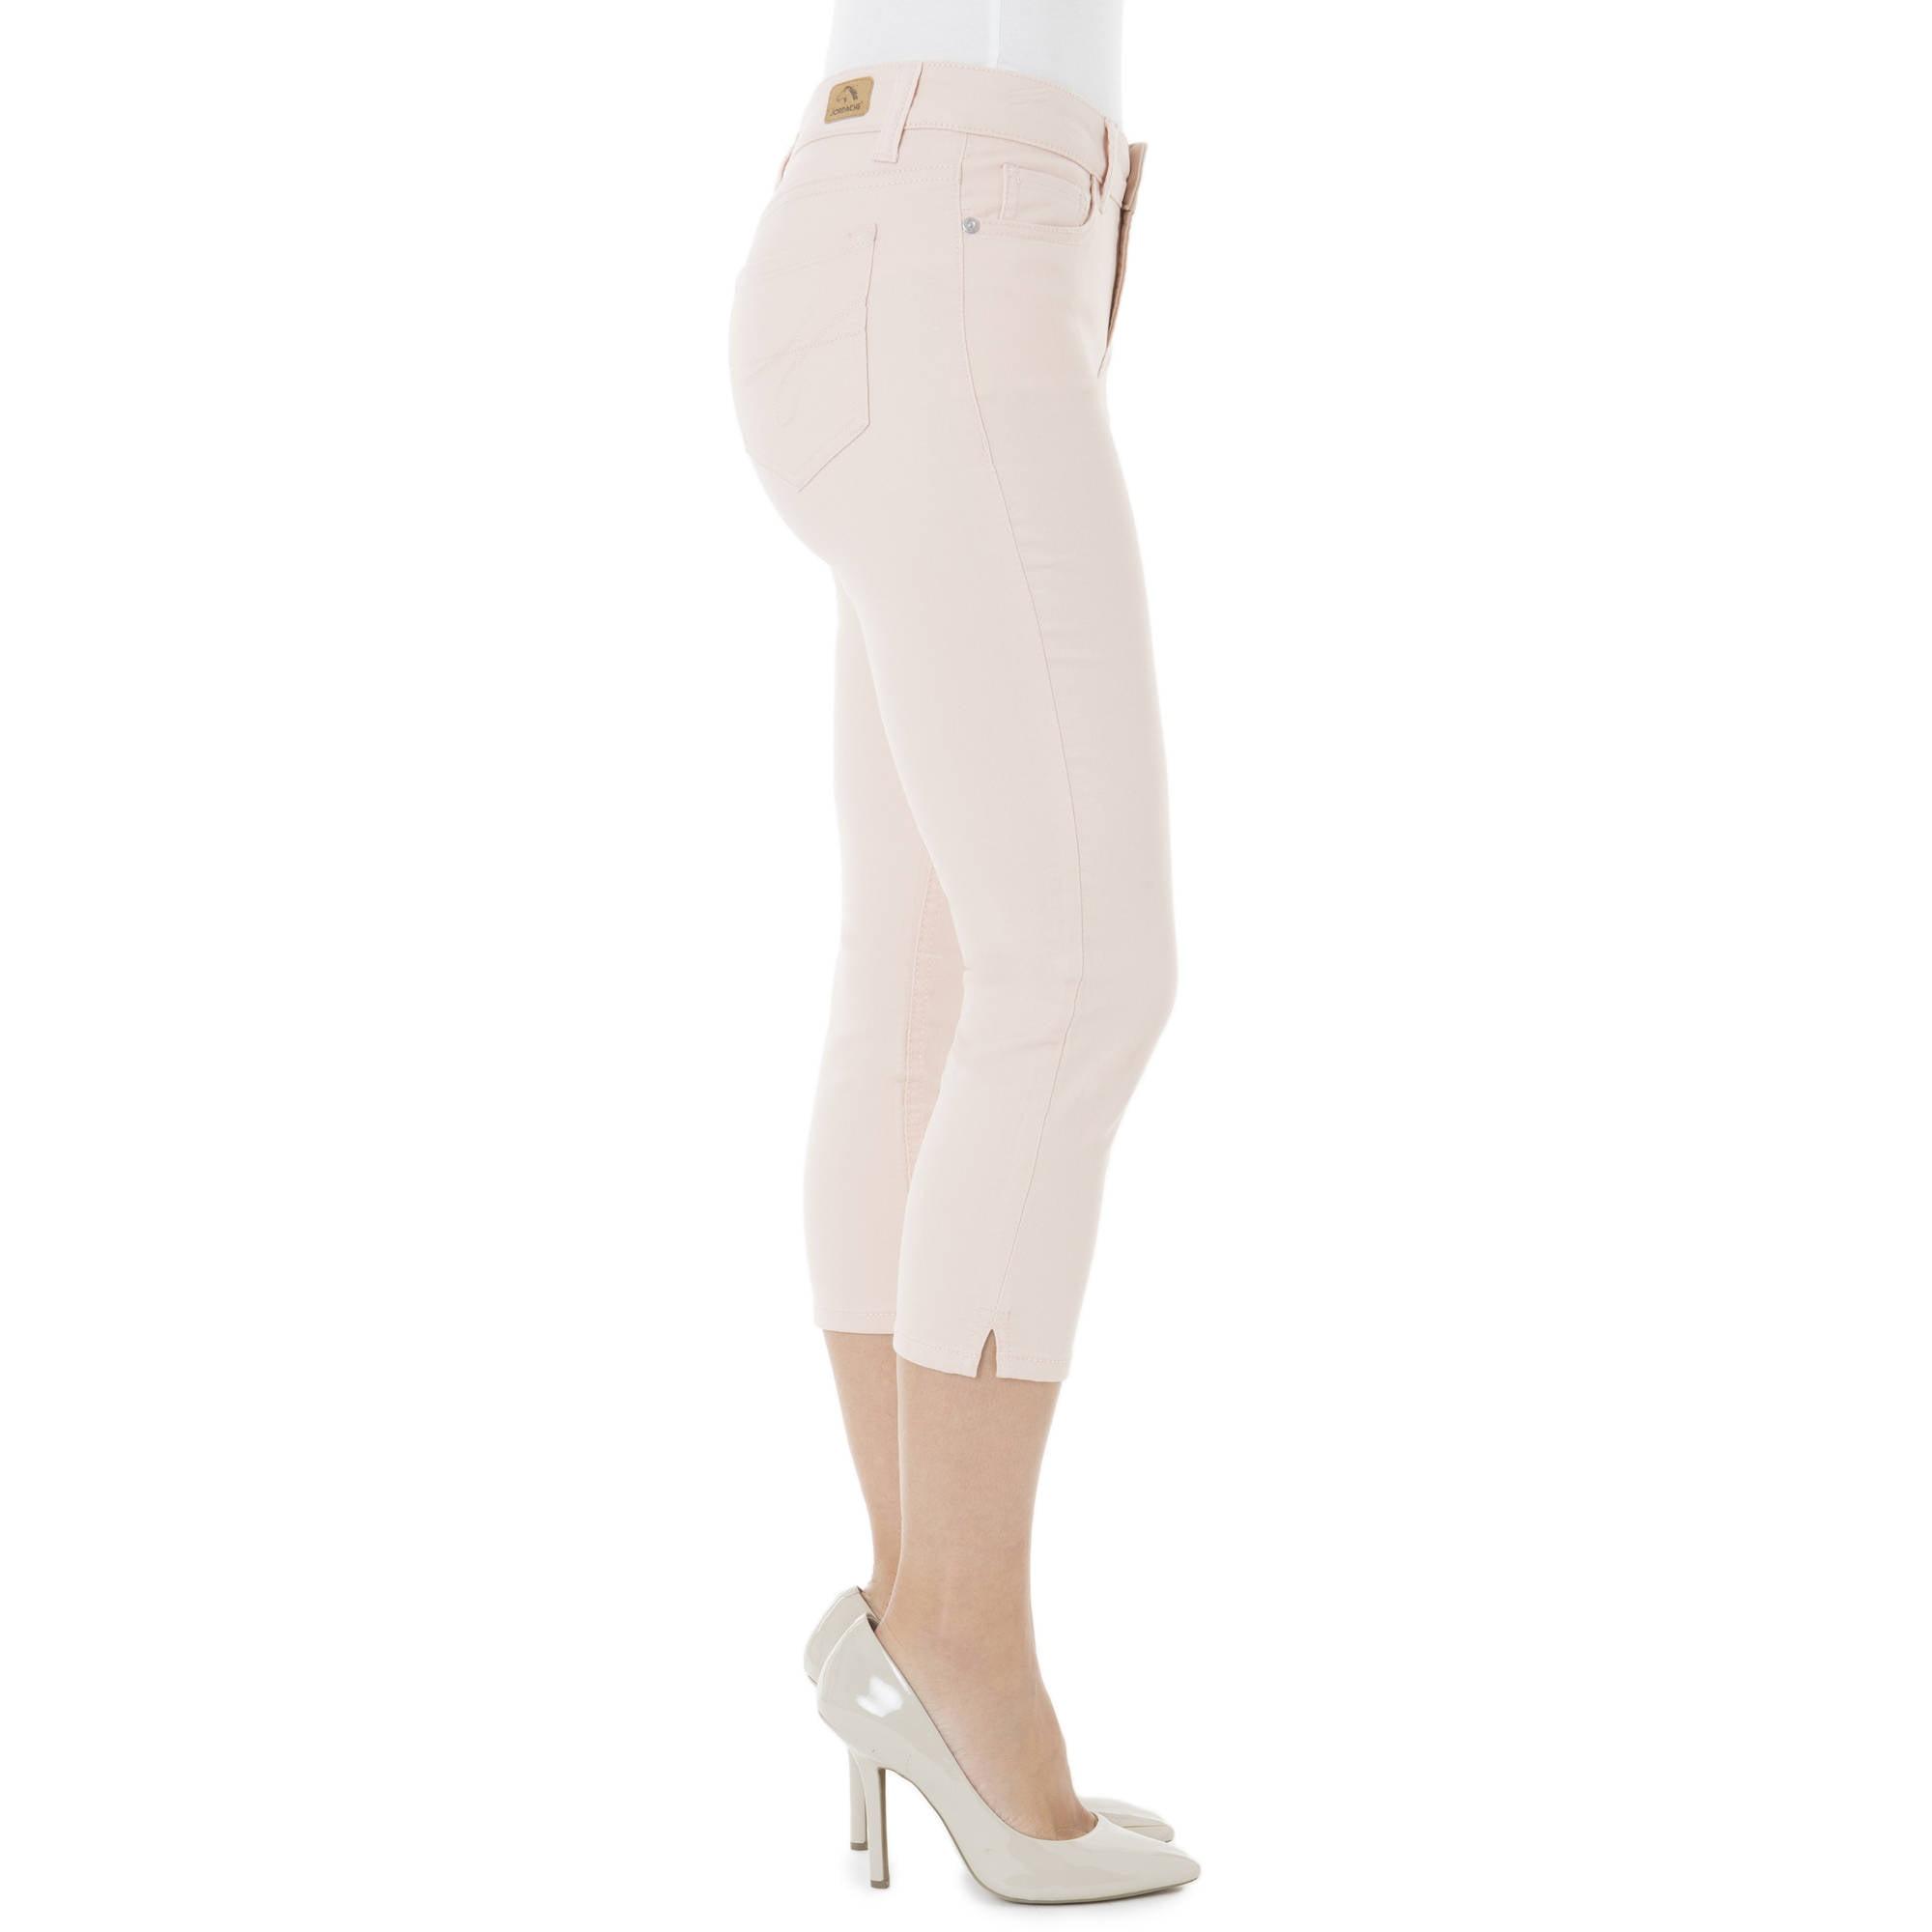 Jordache Women's Skinny Denim Capris - Walmart.com